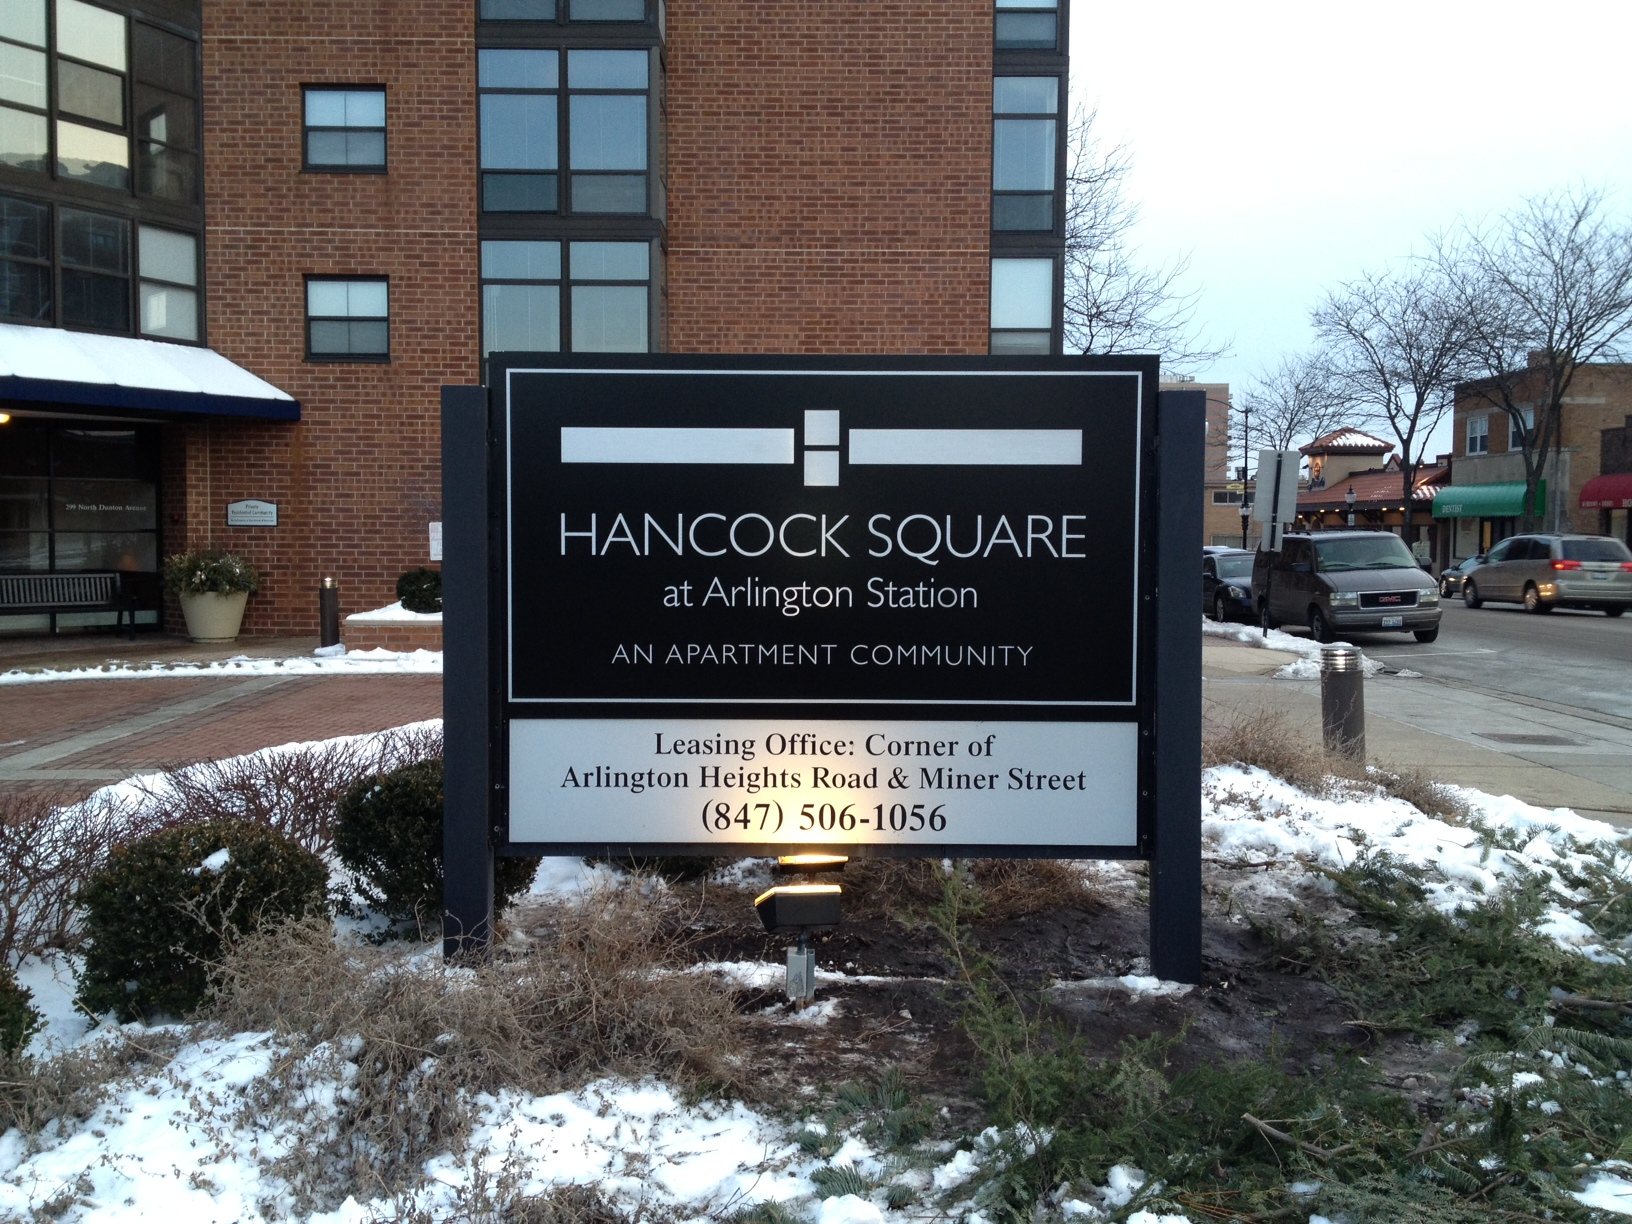 Hancock Square at Arlington Monument Sign